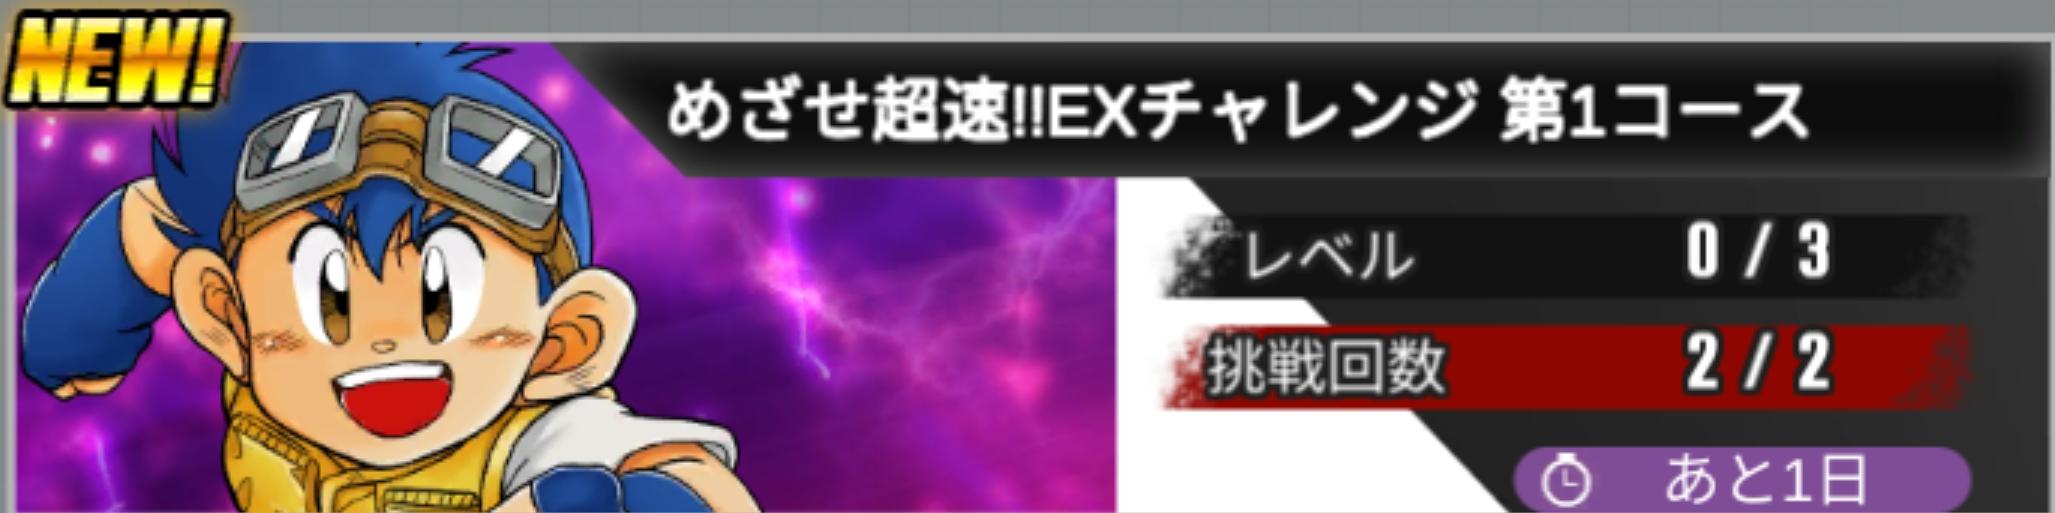 /theme/dengekionline/mini4wd/images/limited/EX_challenge/banner01